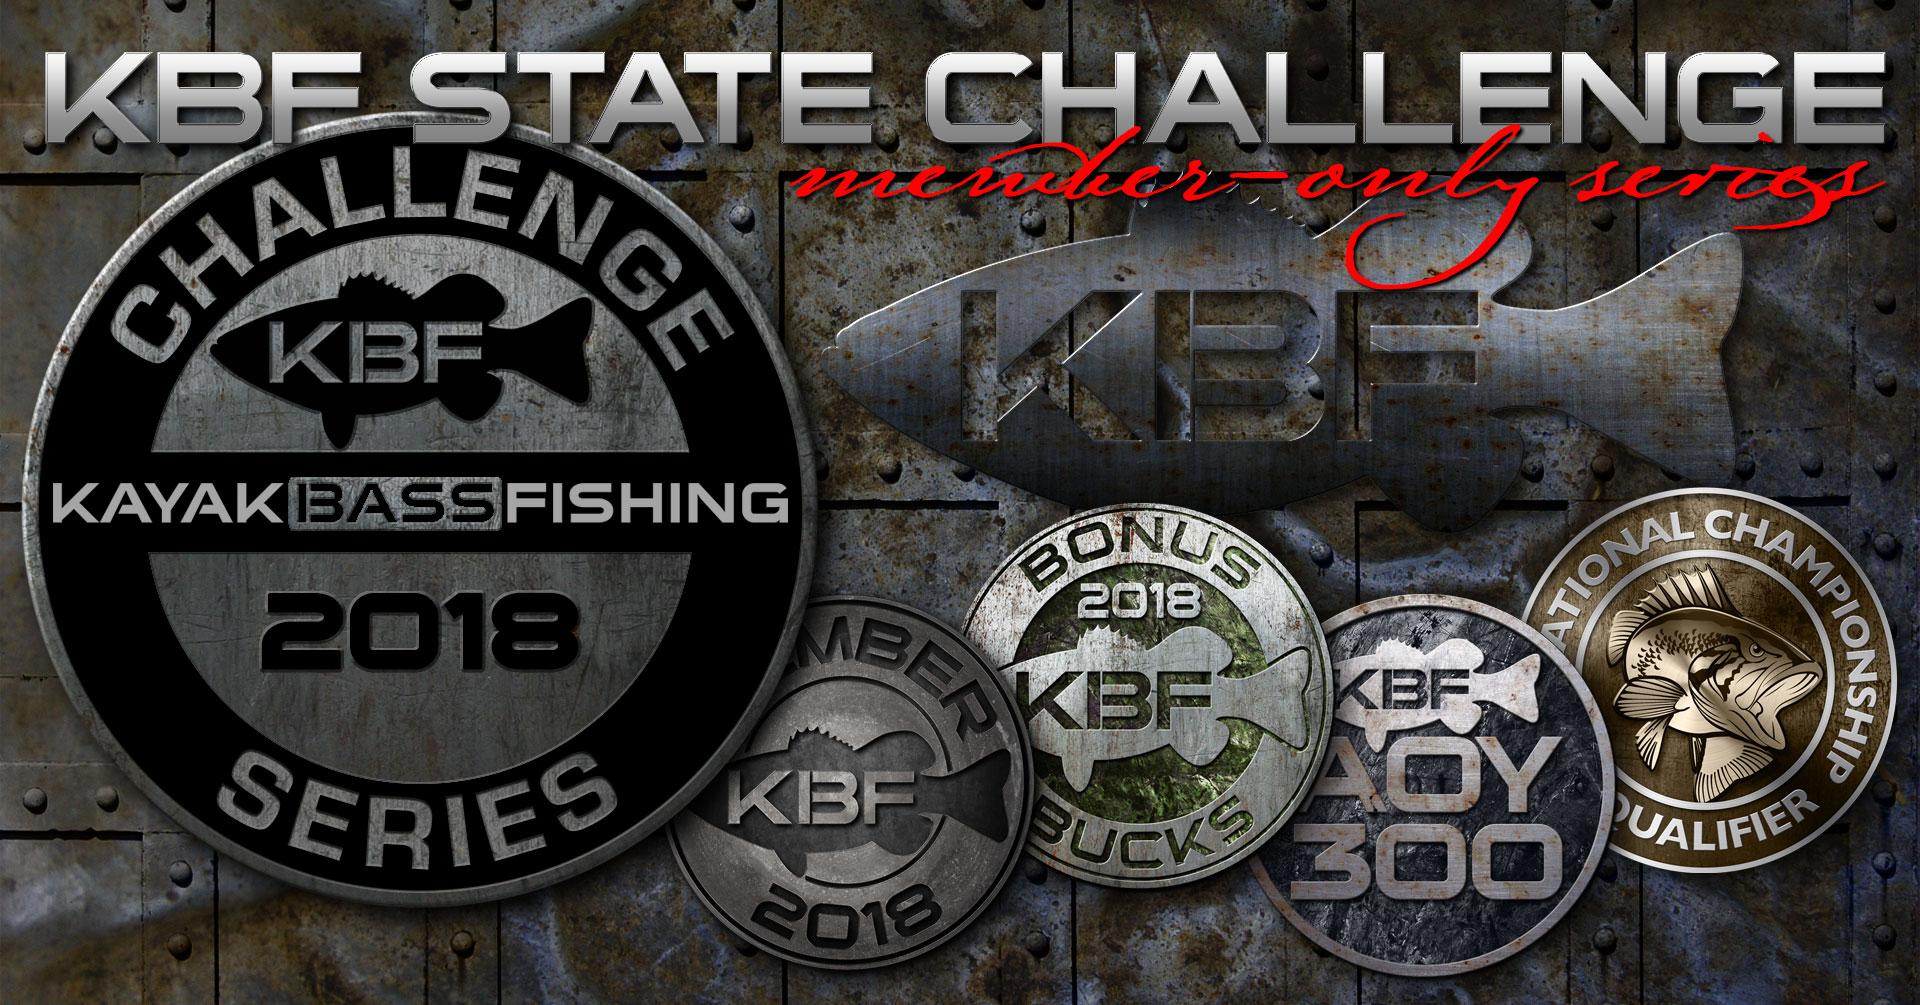 2018 KBF State Challenge